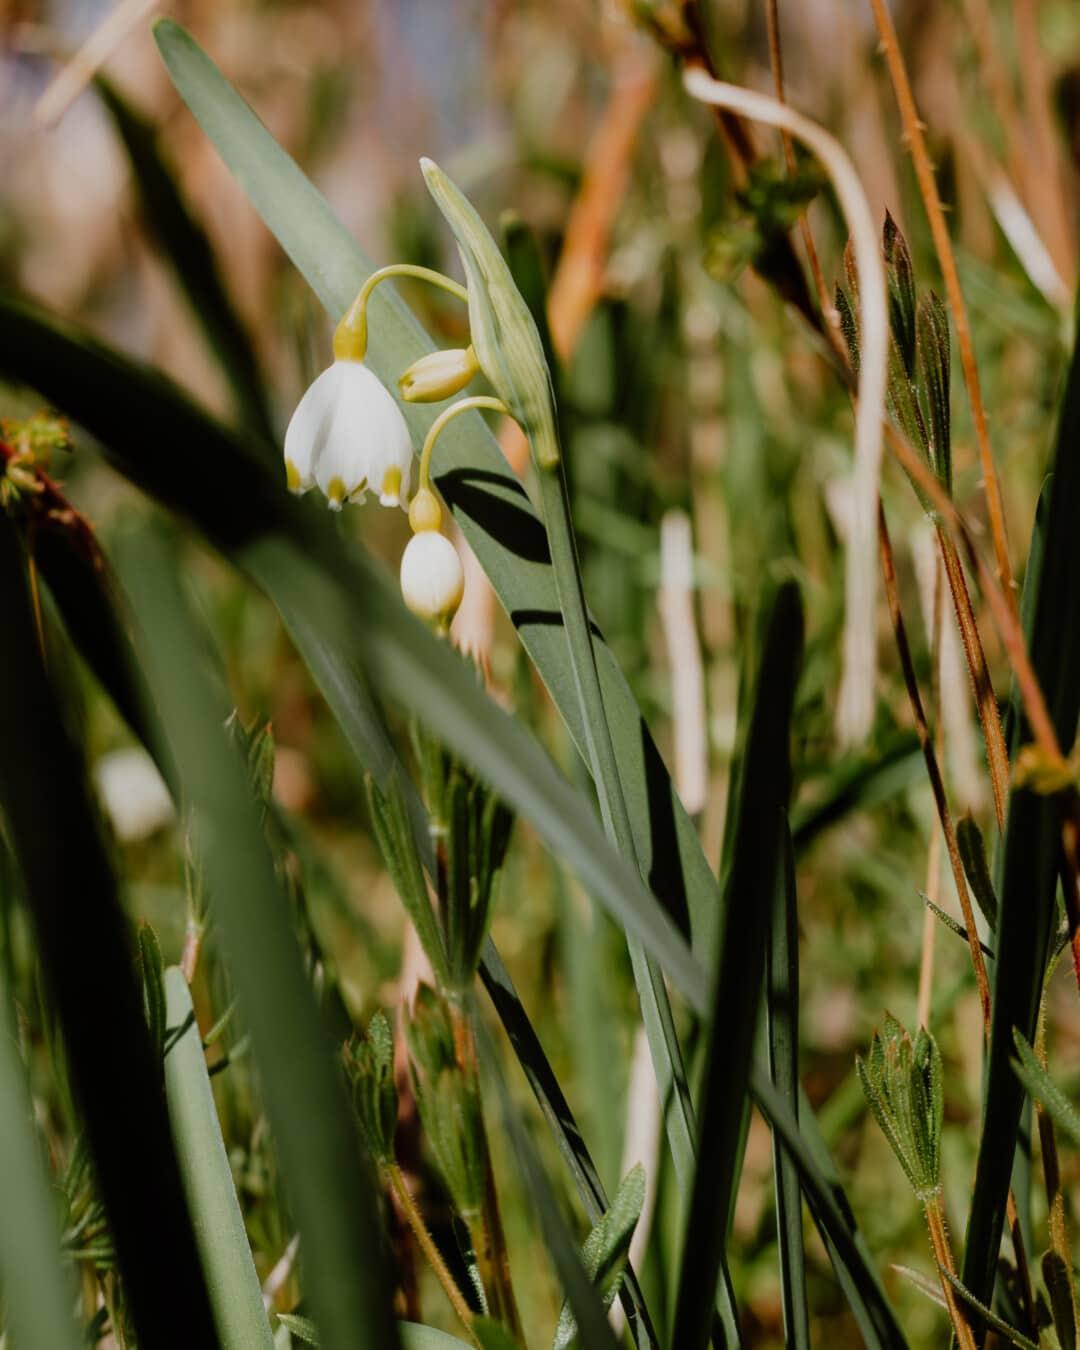 Blütenknospe, weiße Blume, Winter, Frühling, Gras, Stamm, Flora, Frühling, Blatt, Natur